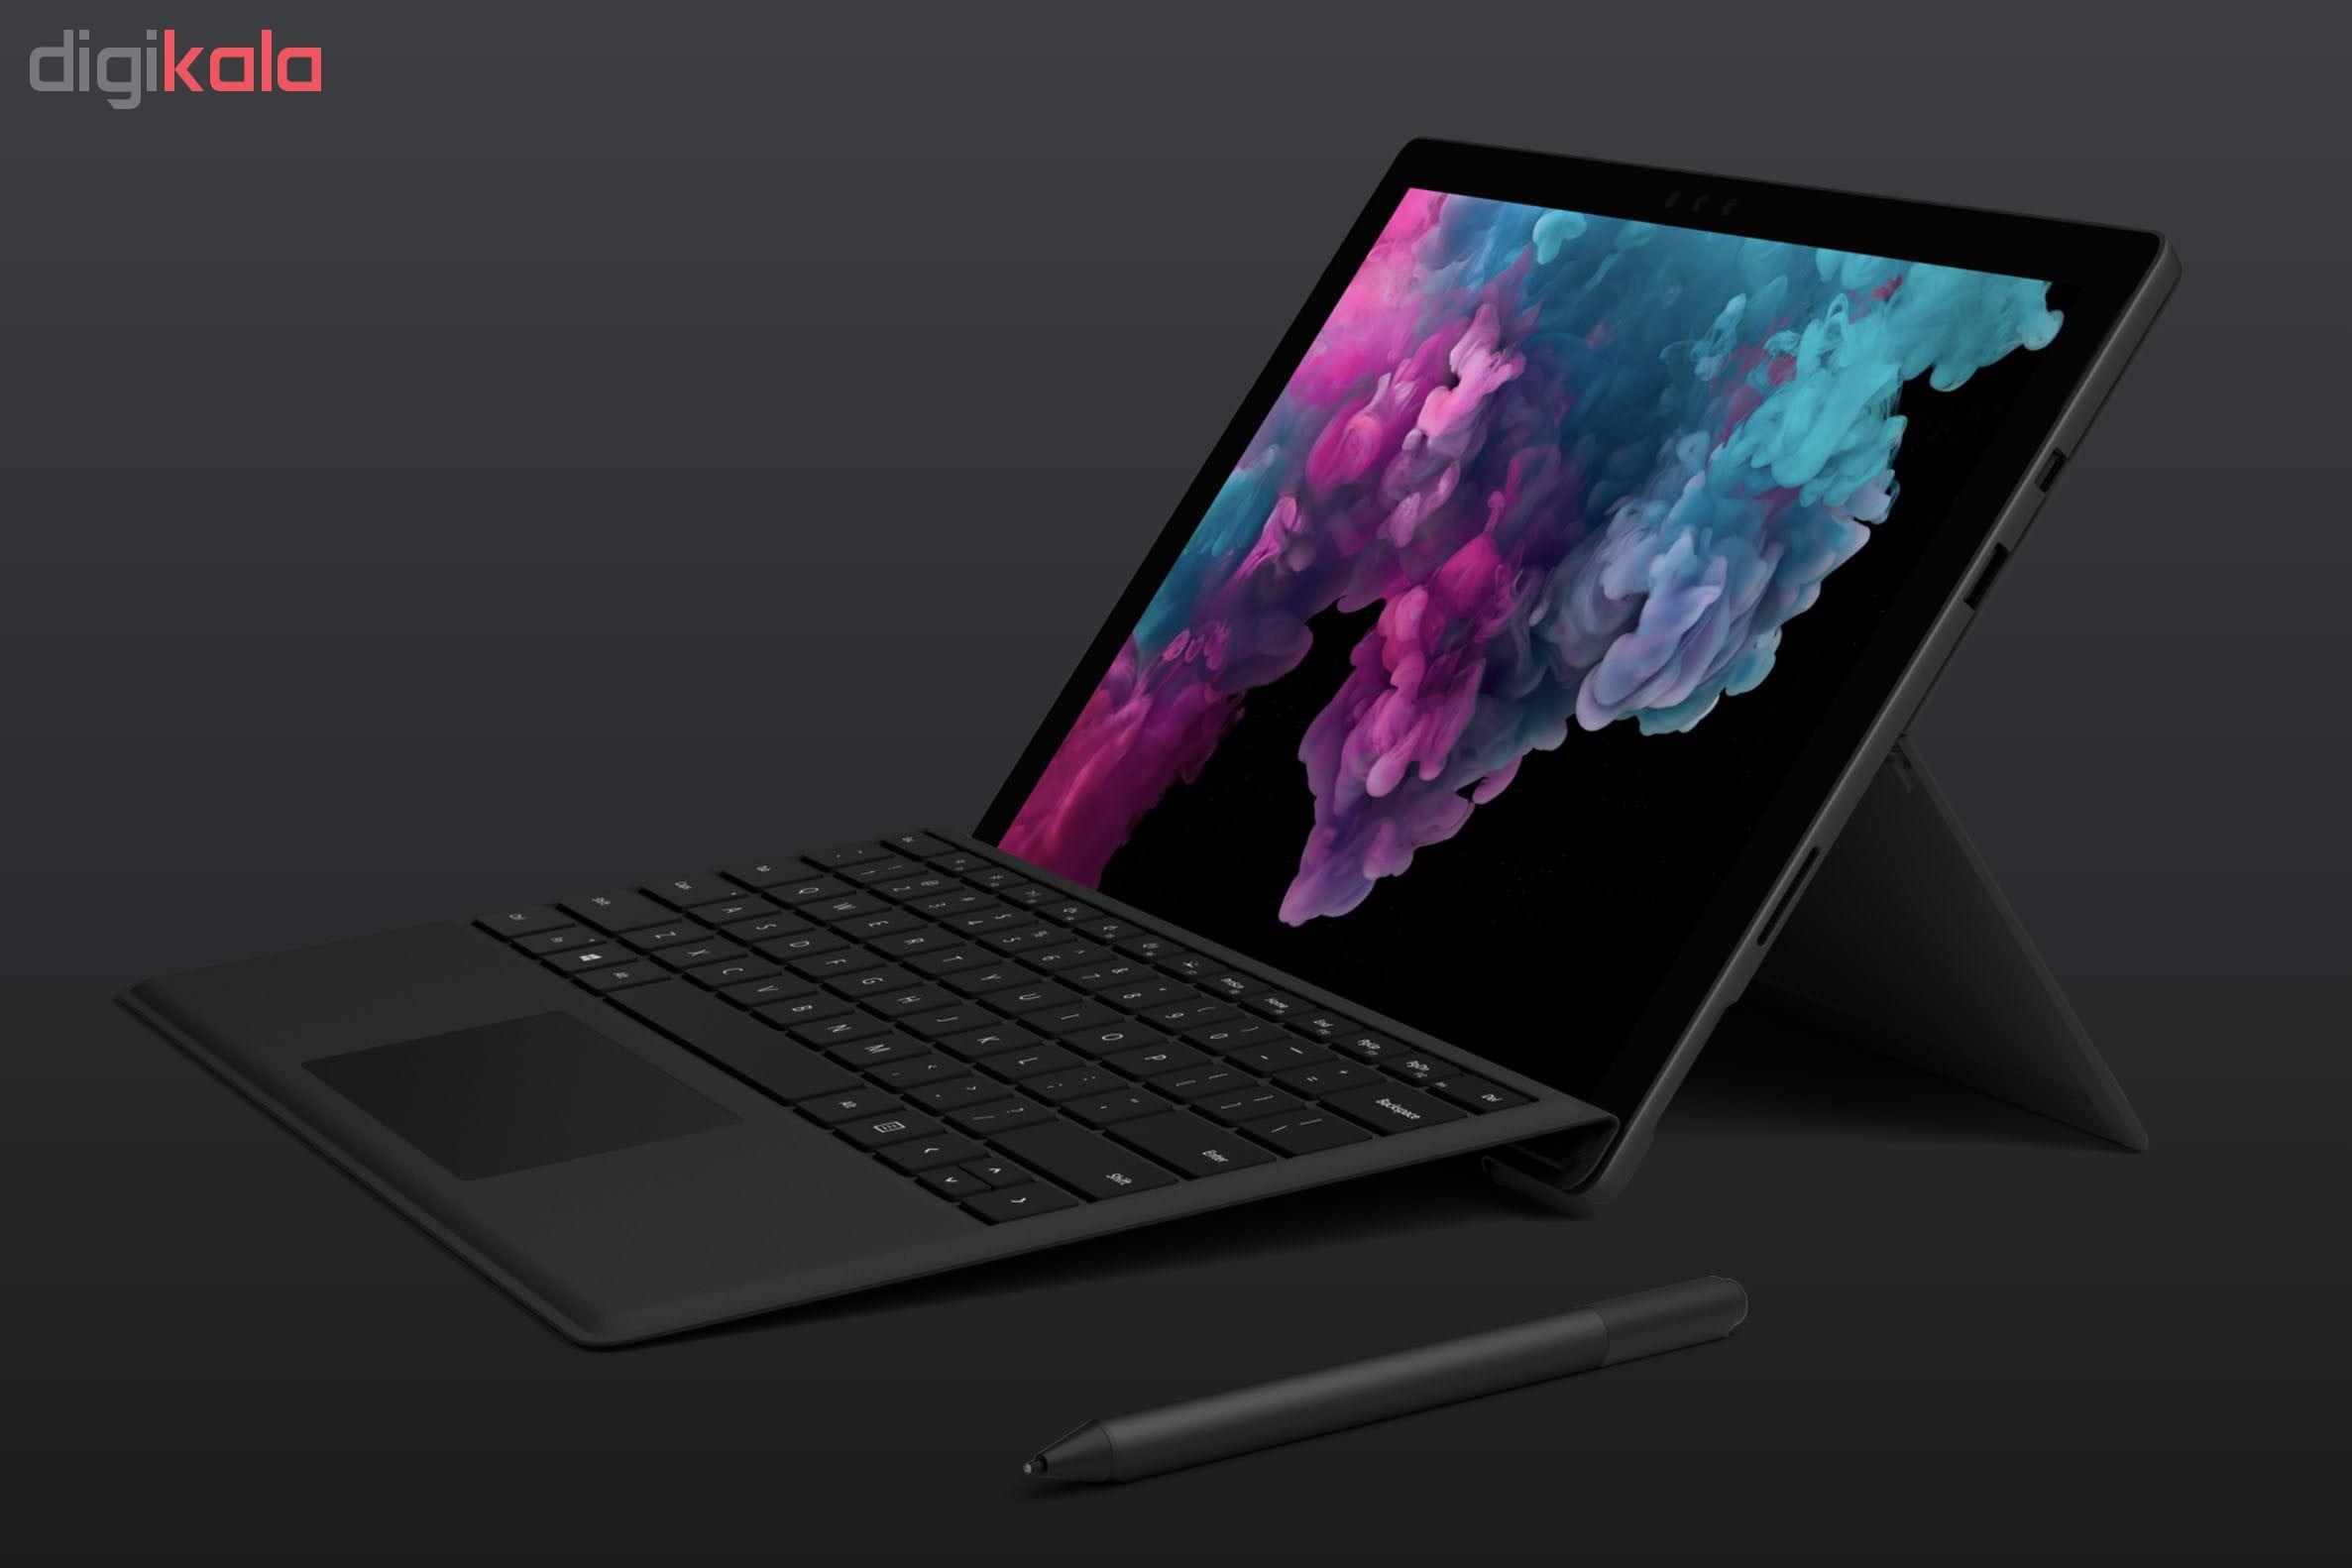 تبلت مایکروسافت مدل Surface Pro 6 - B main 1 9